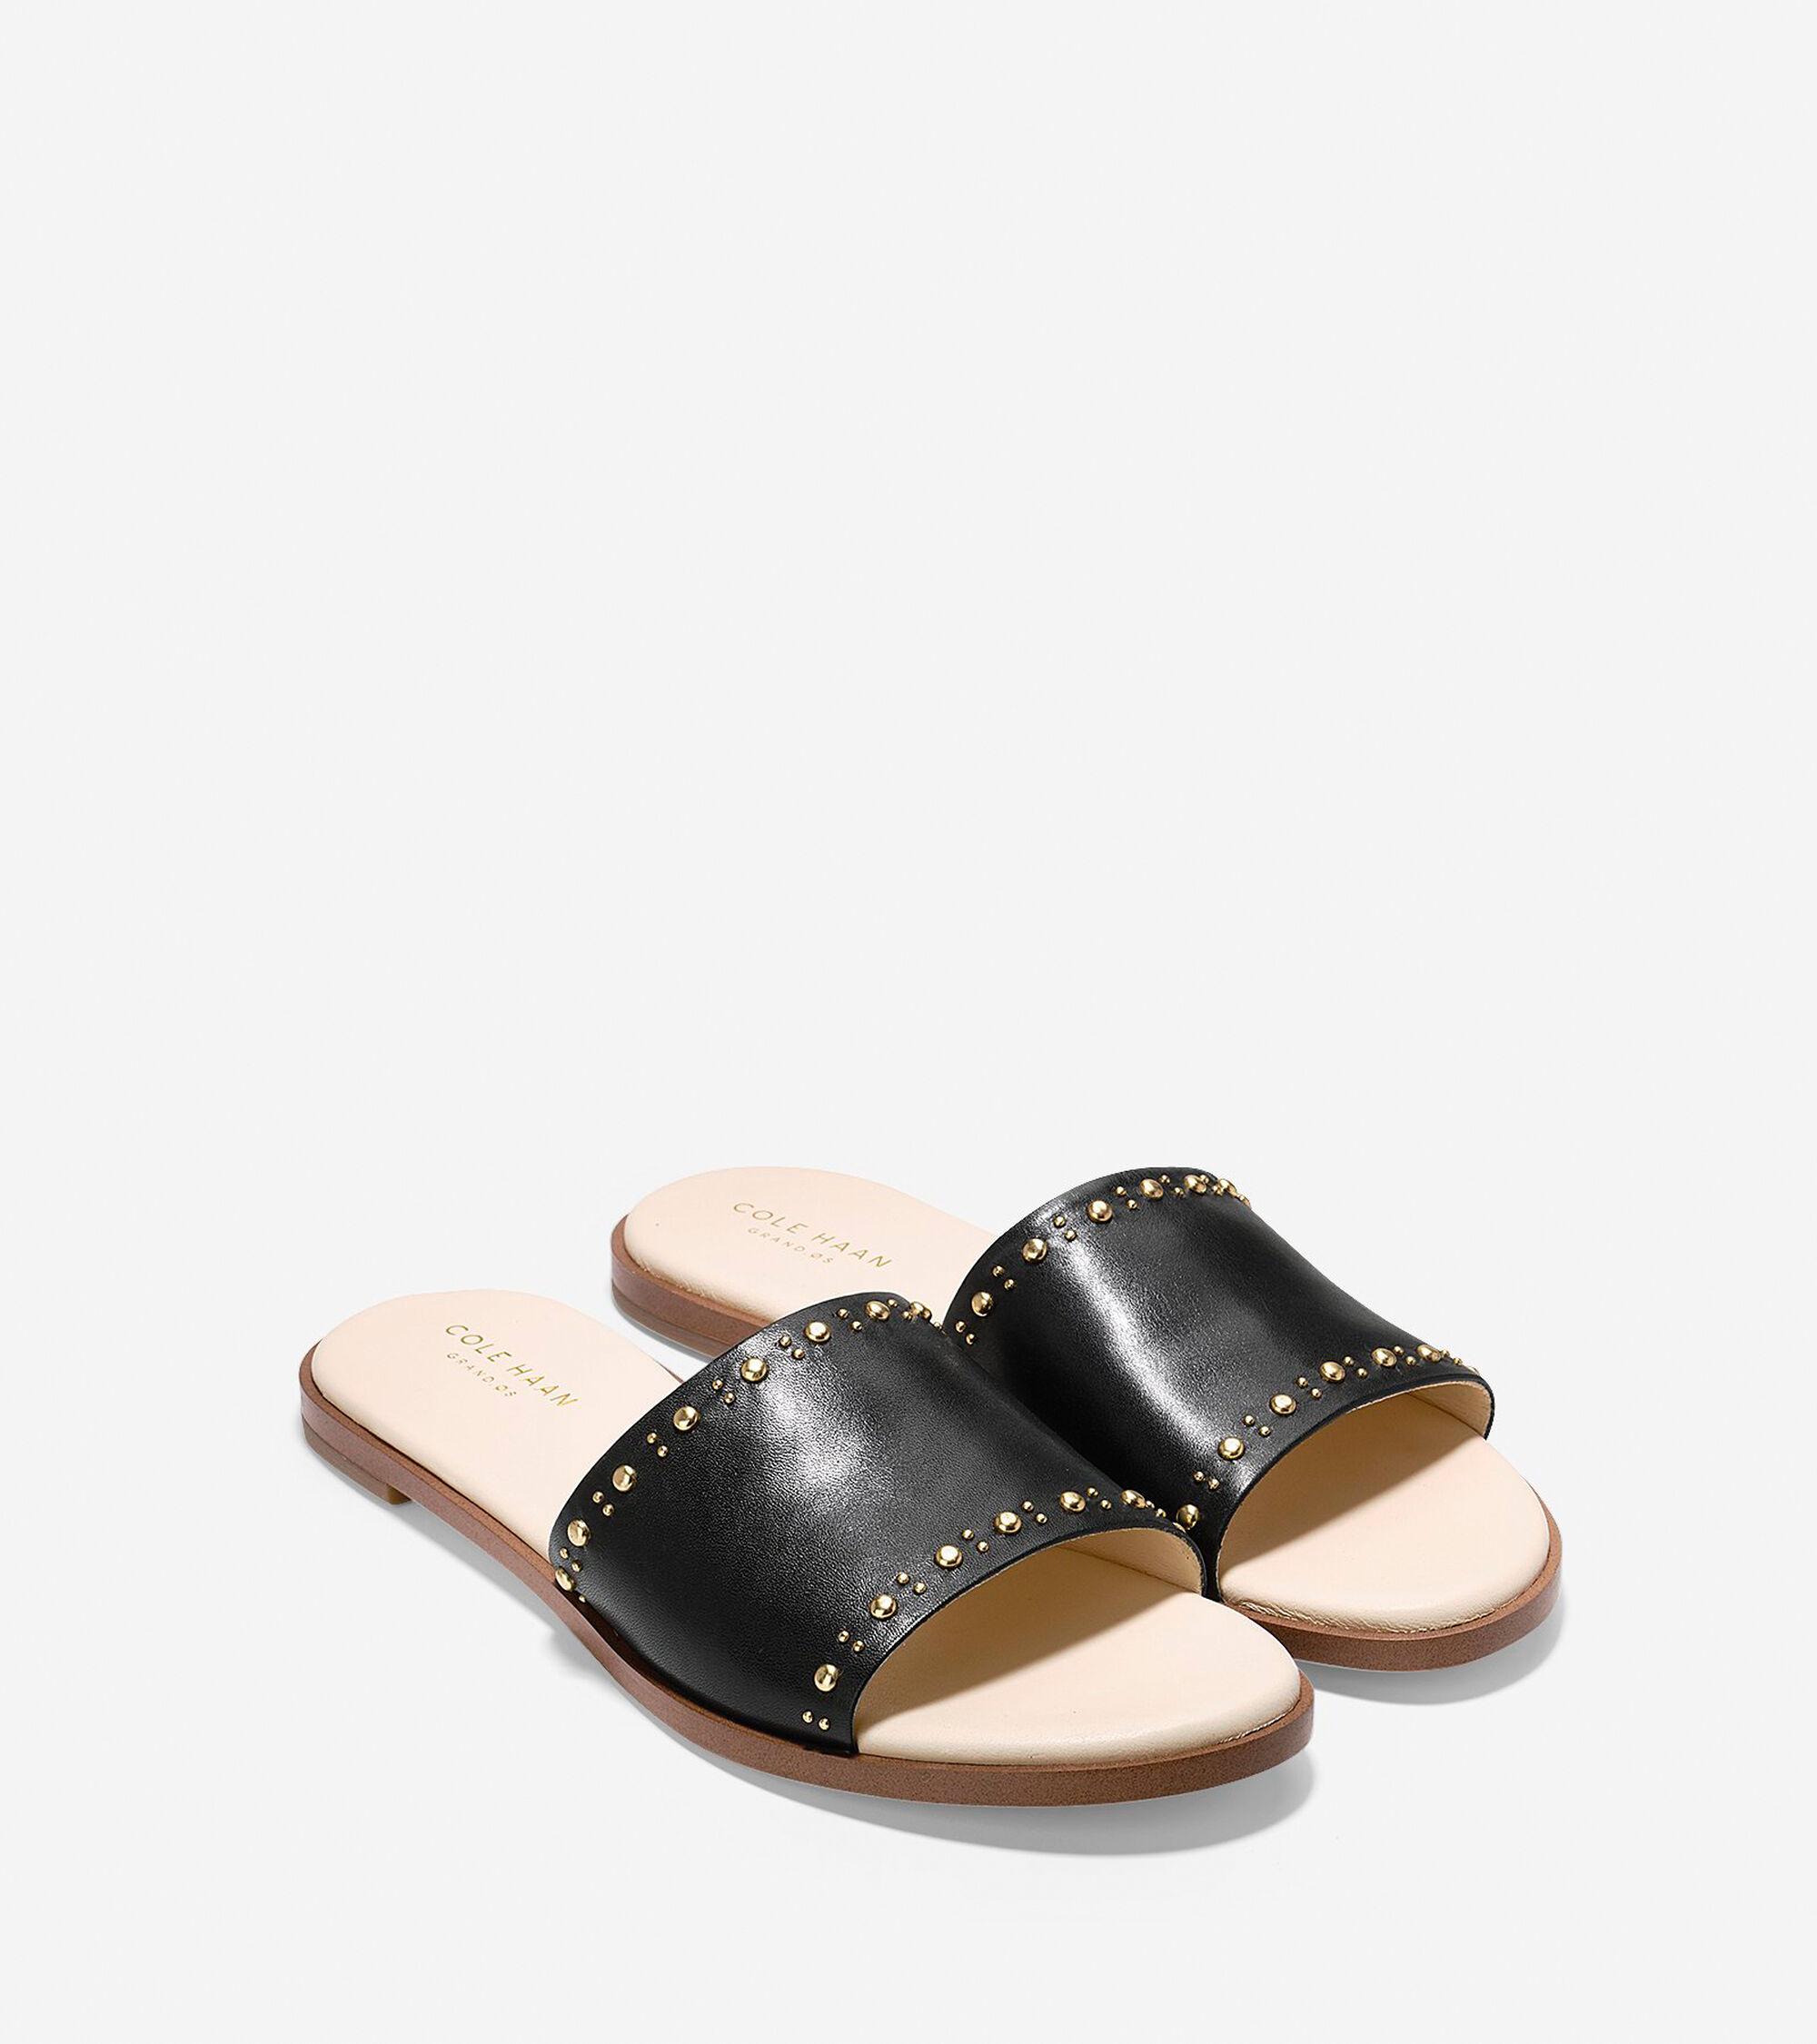 0b058f37bb3e ... Anica Stud Slide Sandal · Anica Stud Slide Sandal.  COLEHAAN